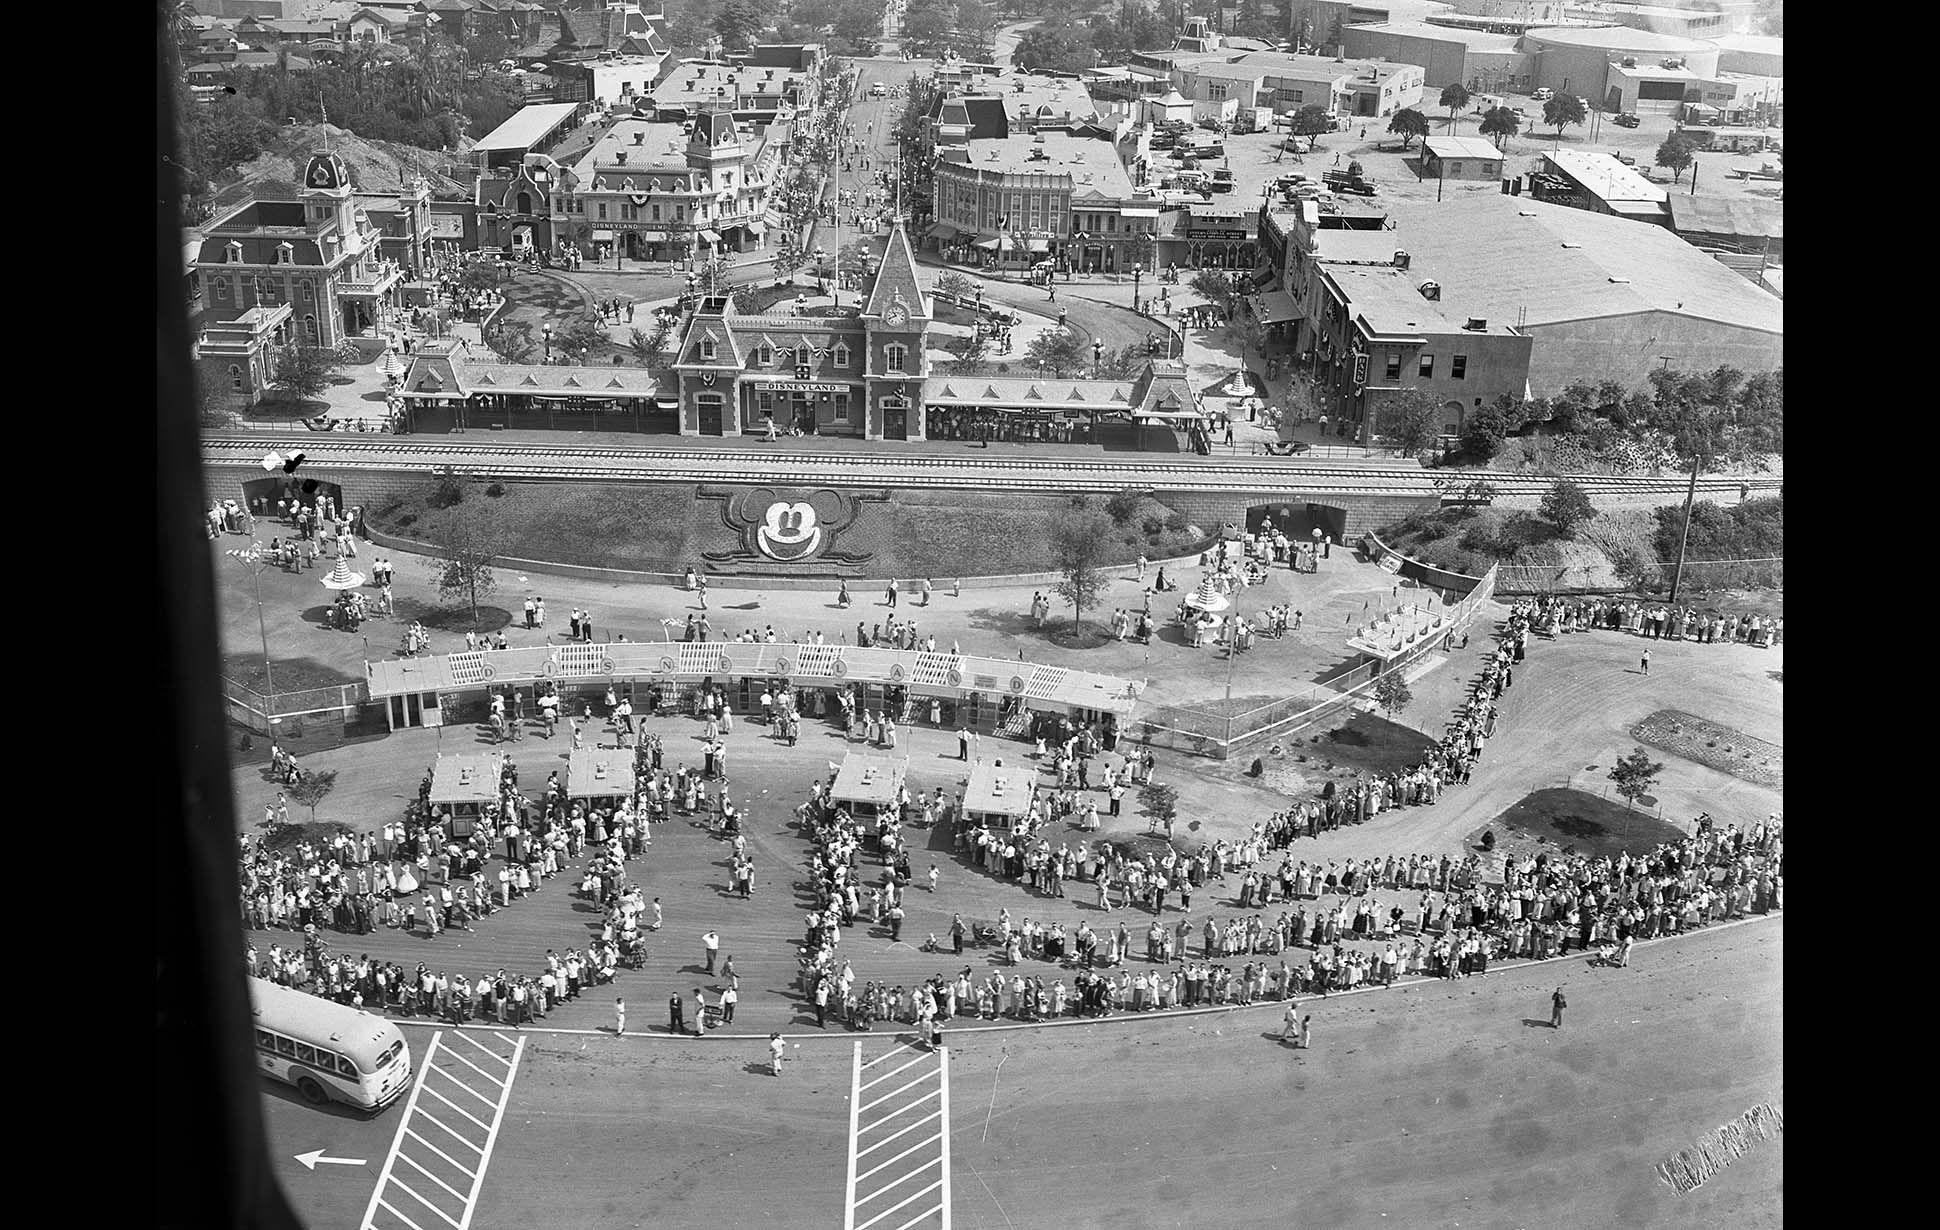 Disneyland S 1955 Opening Vintage Disneyland Disneyland Opening Day Disneyland Anaheim